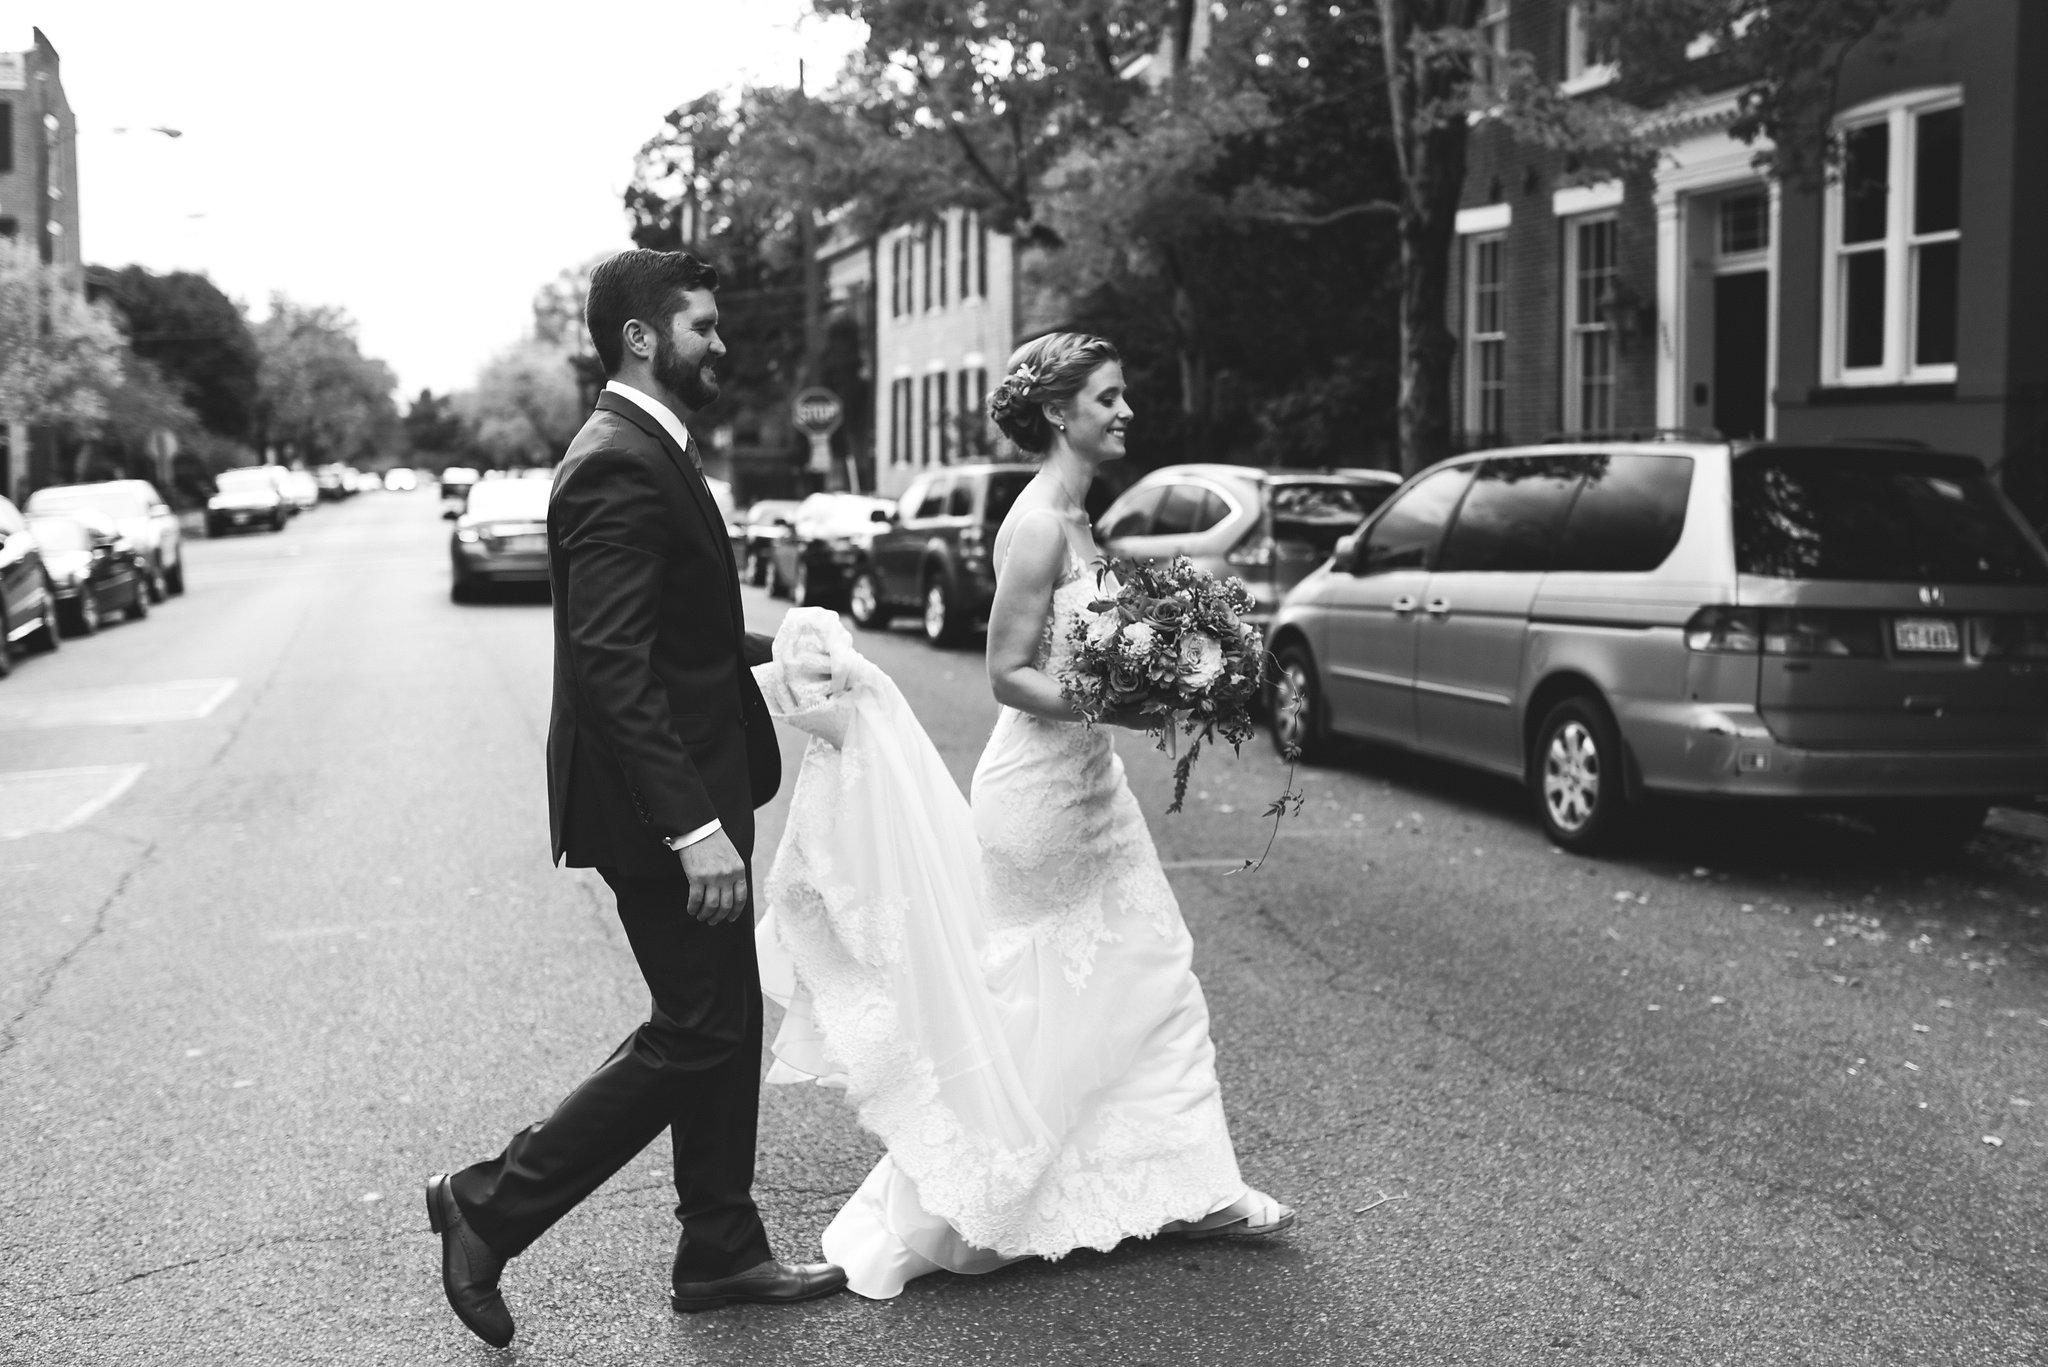 Alexandria, Virginia, Autumn Wedding, Historic Wedding, Old Town, DC, Black and White Photo, Outdoor, Bride and Groom, Maryland Wedding Photographer